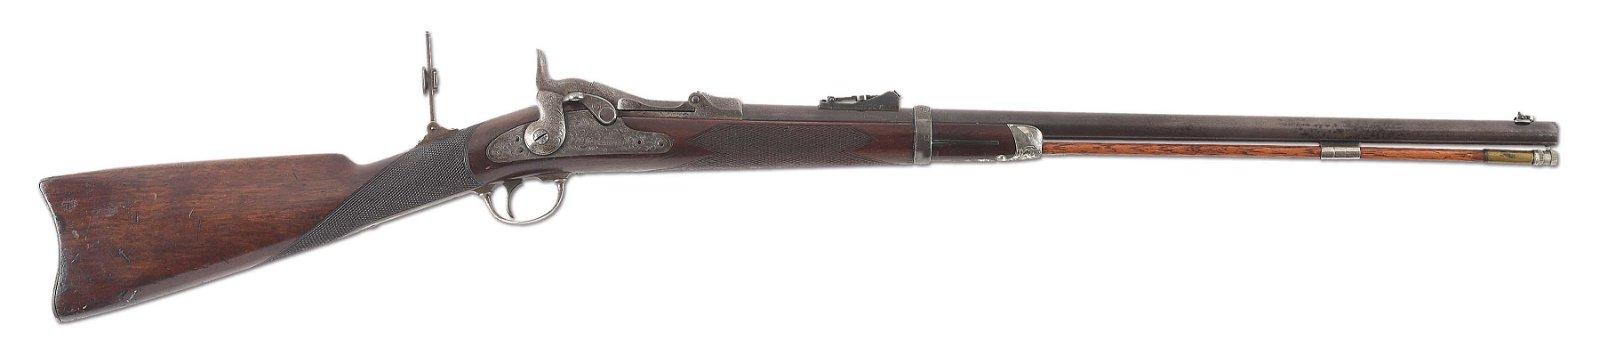 (A) RARE SPRINGFIELD TRAPDOOR MODEL 1875 OFFICER'S